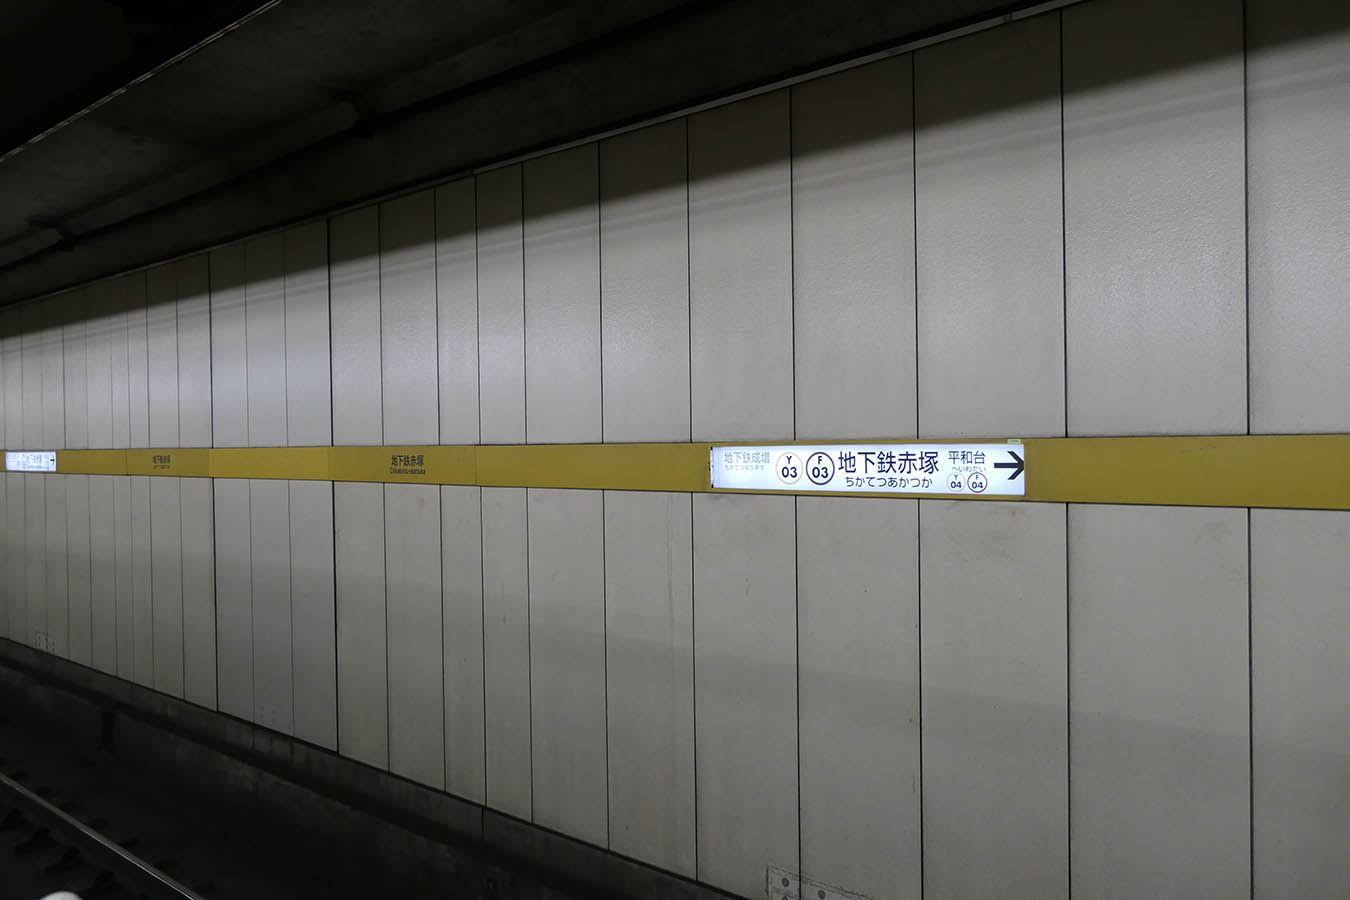 Y03_photo01.jpg